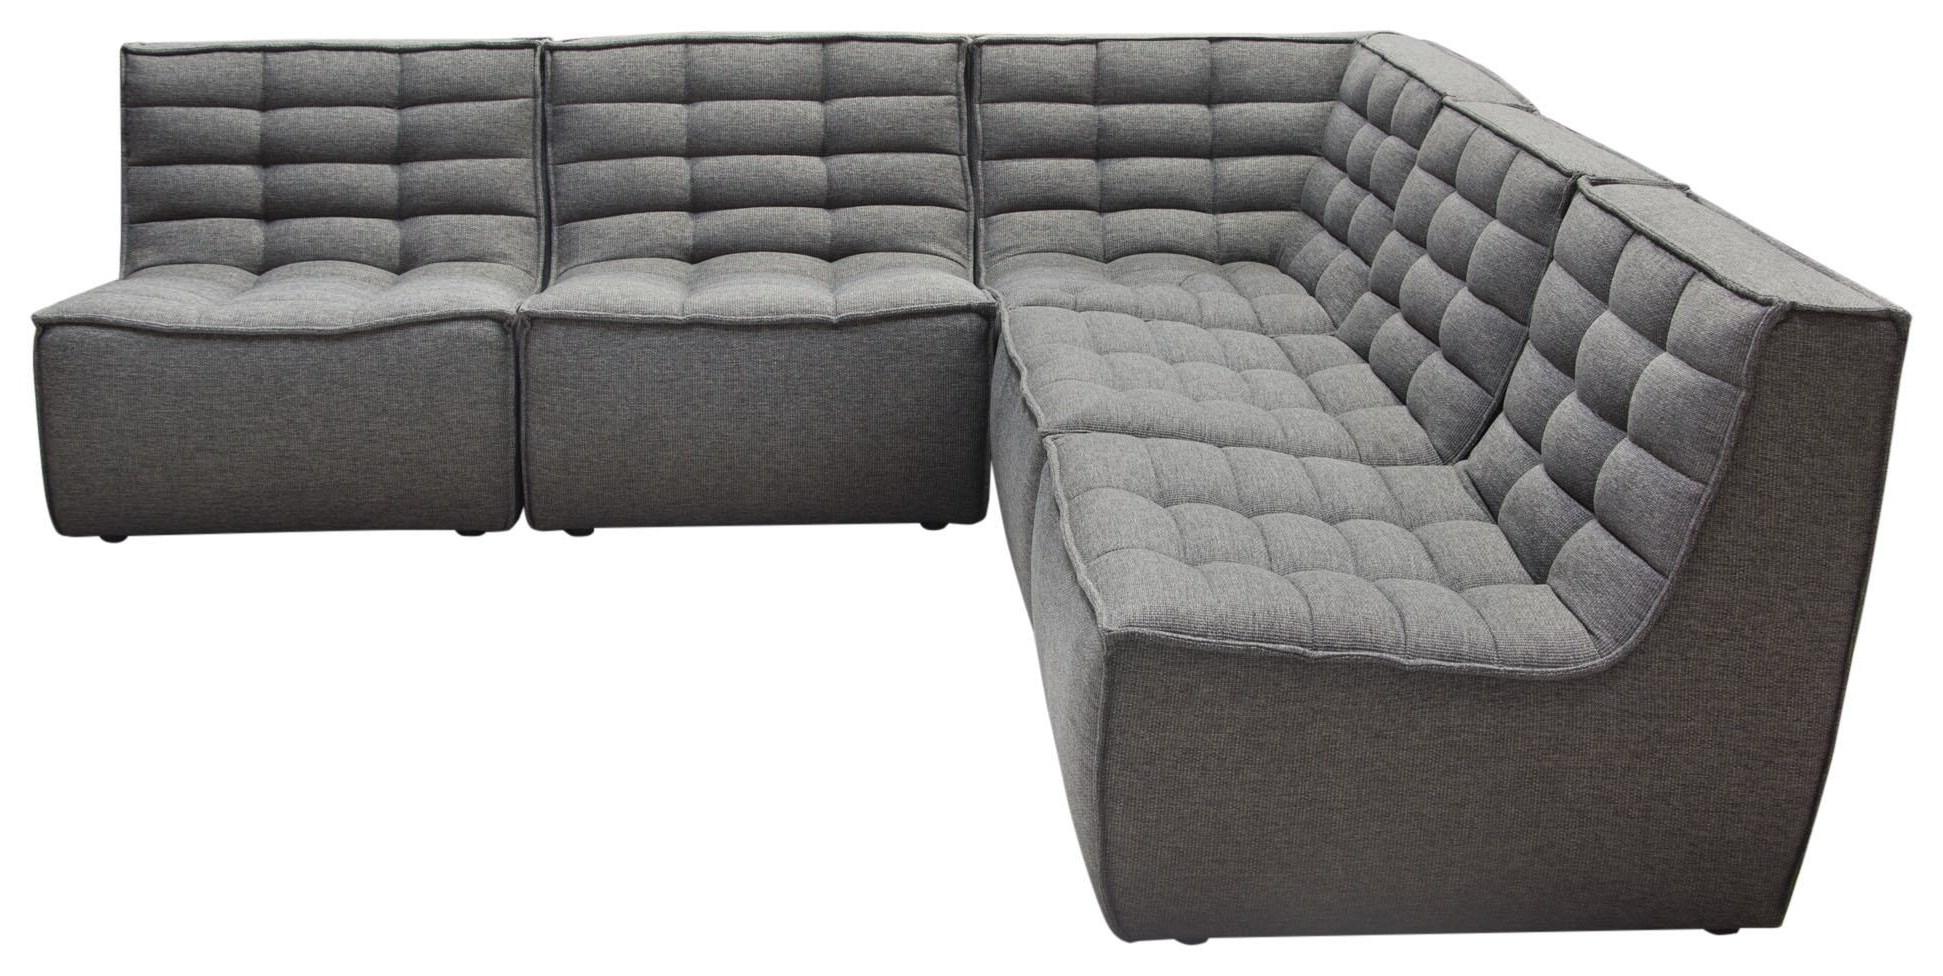 Marshall Sectional by Diamond Sofa at HomeWorld Furniture